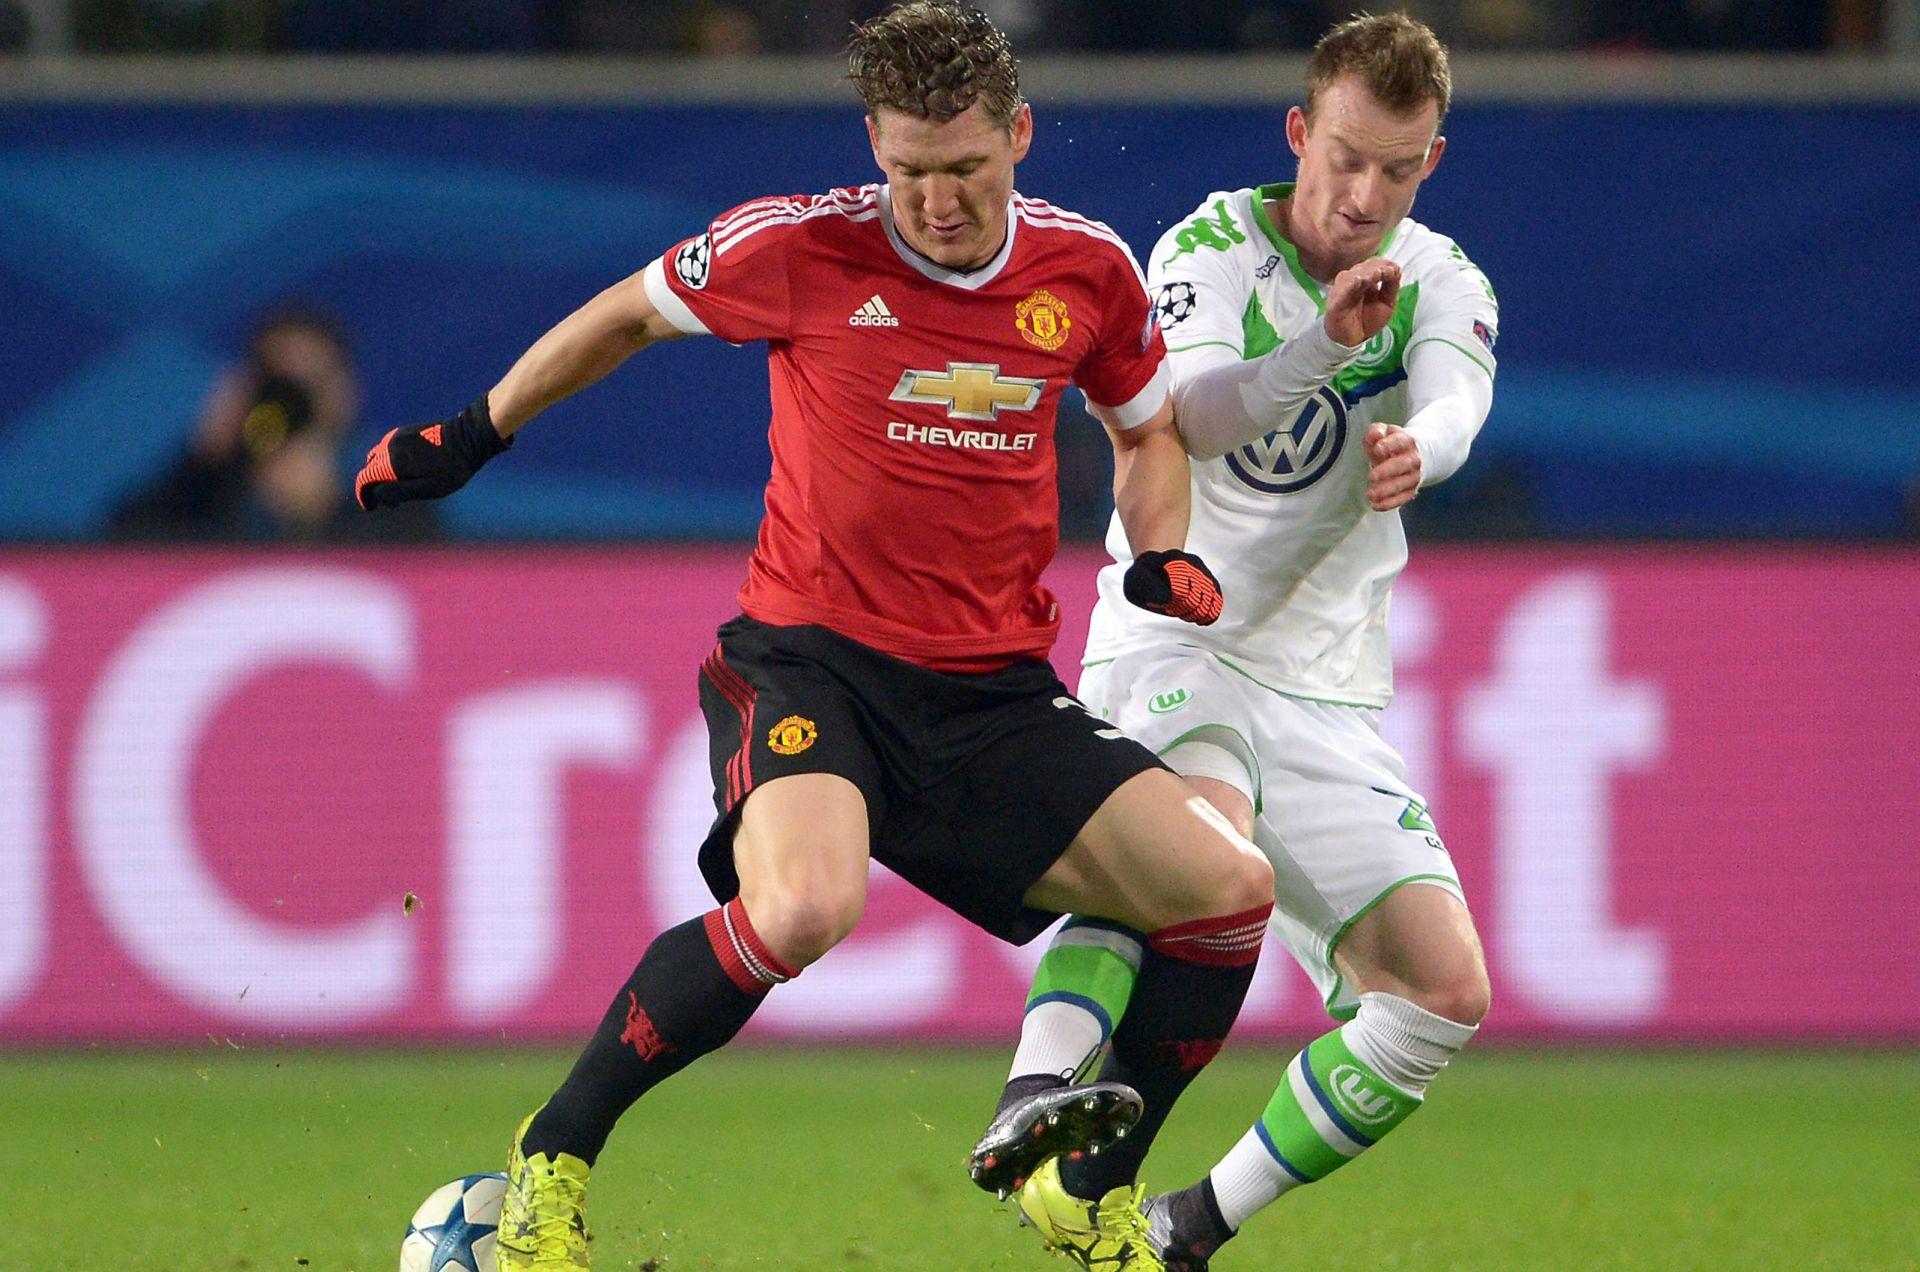 UDARCI NA UTAKMICI: Schweinsteiger suspendiran na tri utakmice